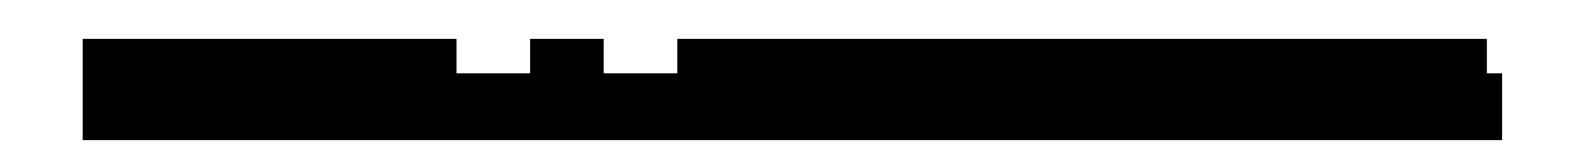 sale retailer 6bd0d 6bab9 MYKITA | HANDCRAFTED EYEWEAR DESIGN – COLLECTIONS / MYKITA + ...